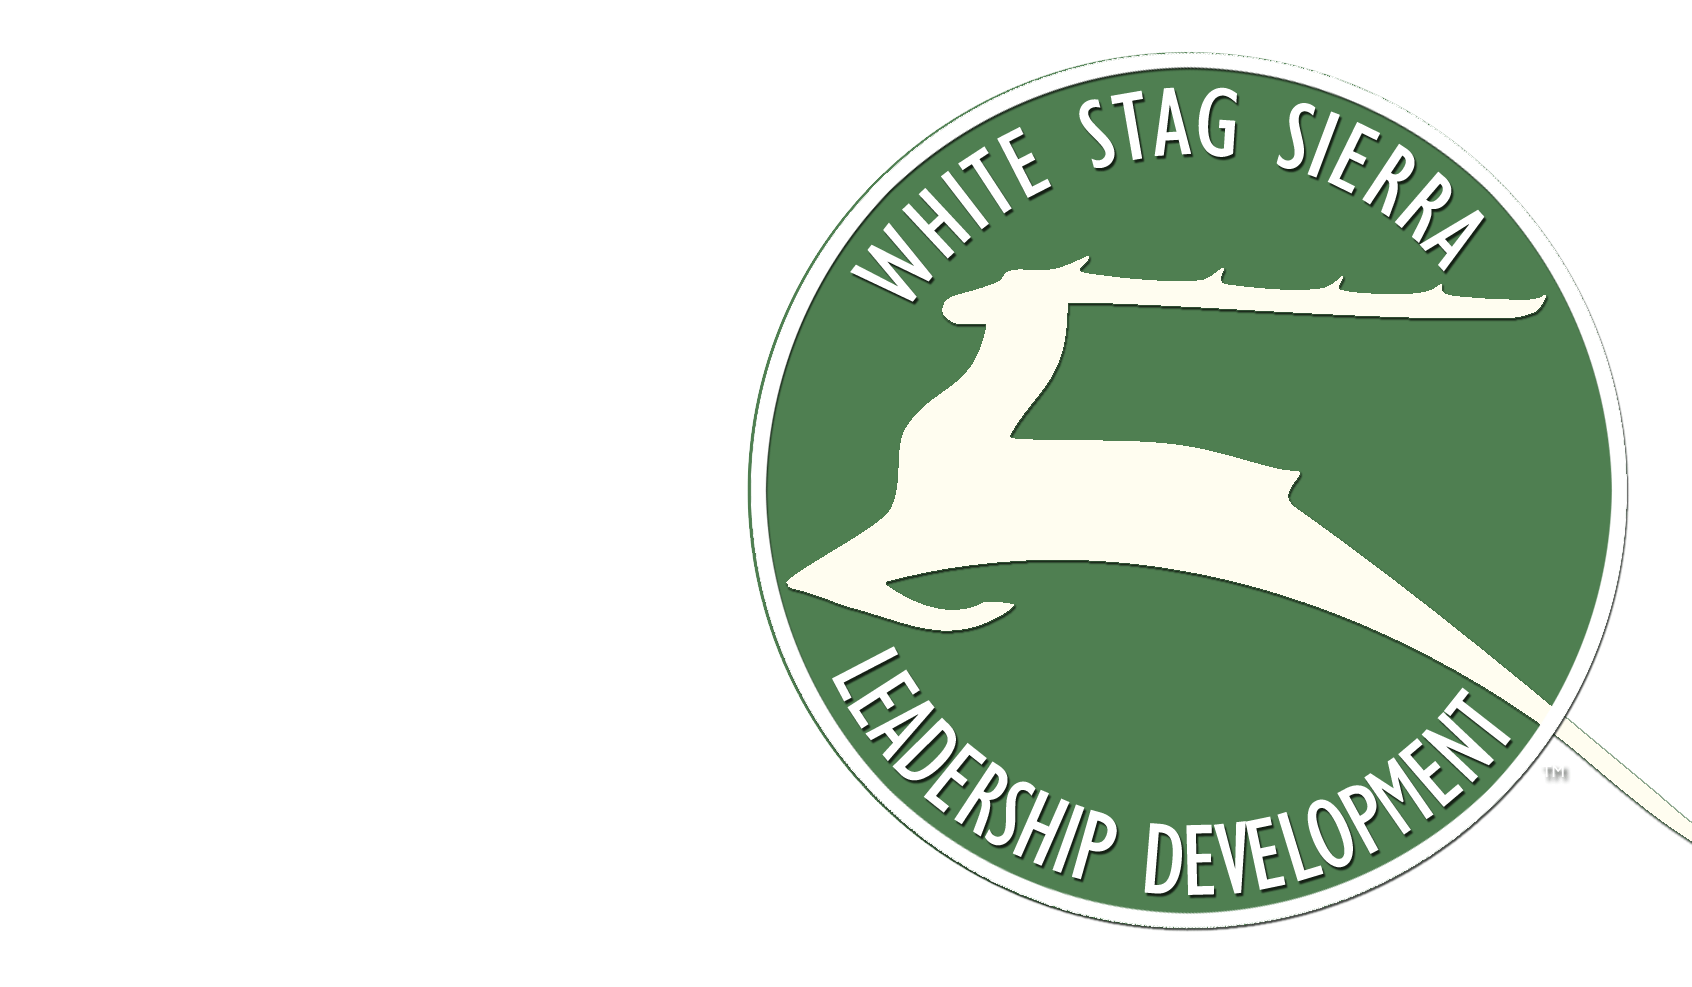 White Stag Sierra